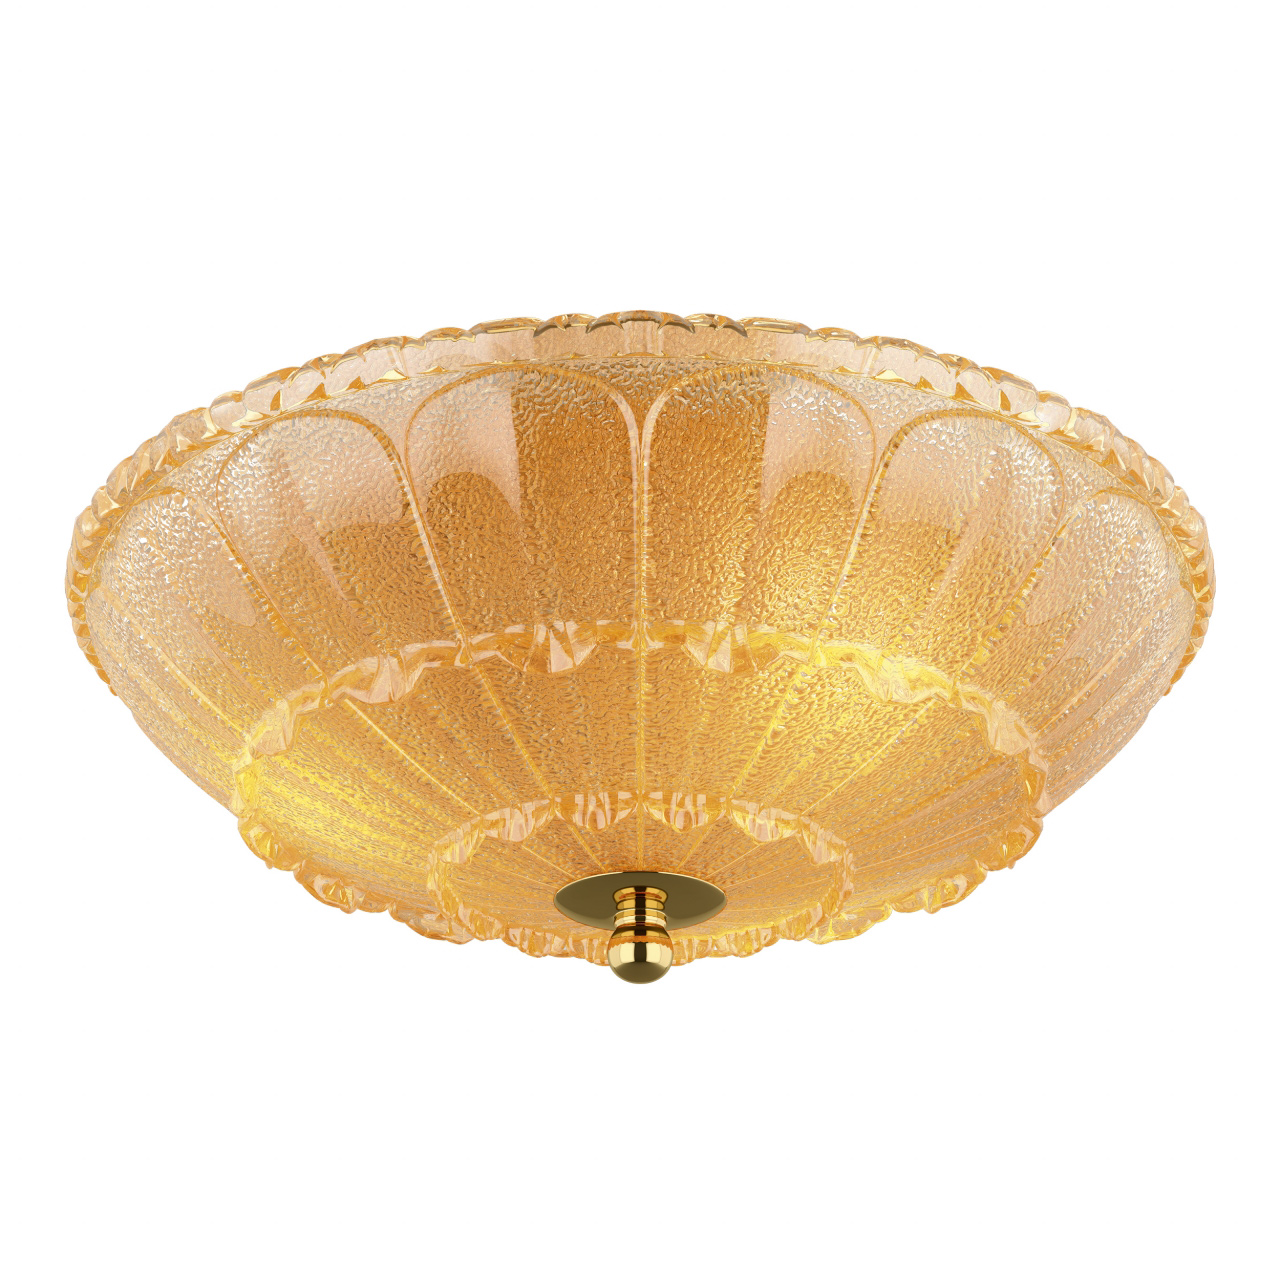 Плафон потолочный Zucche 3х60W E14 золото Lightstar 820232